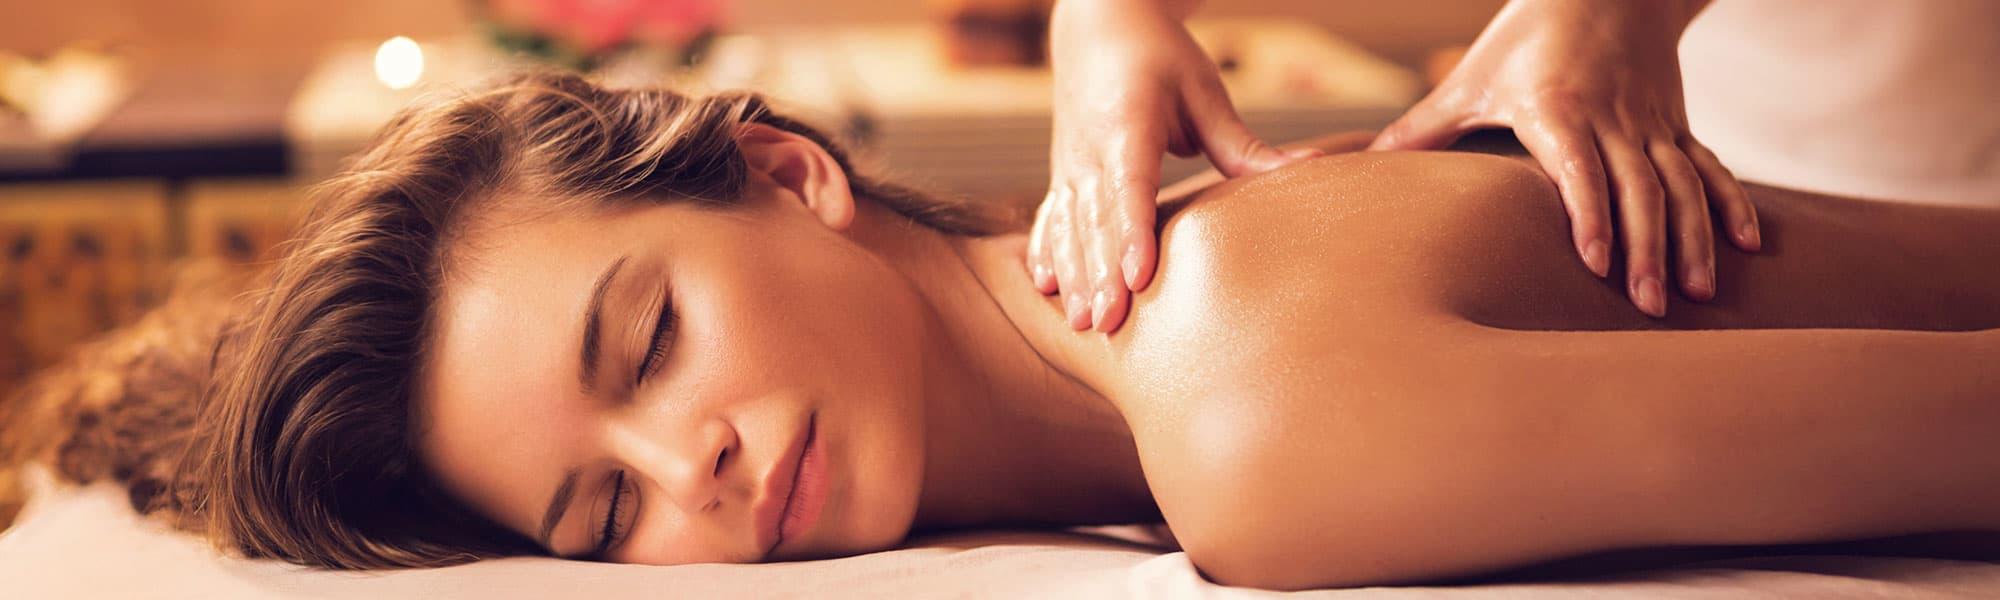 Hotel Los Gatos - A Greystone Hotel - Verde Touch Spa: Massages, Sauna, Steam rooms